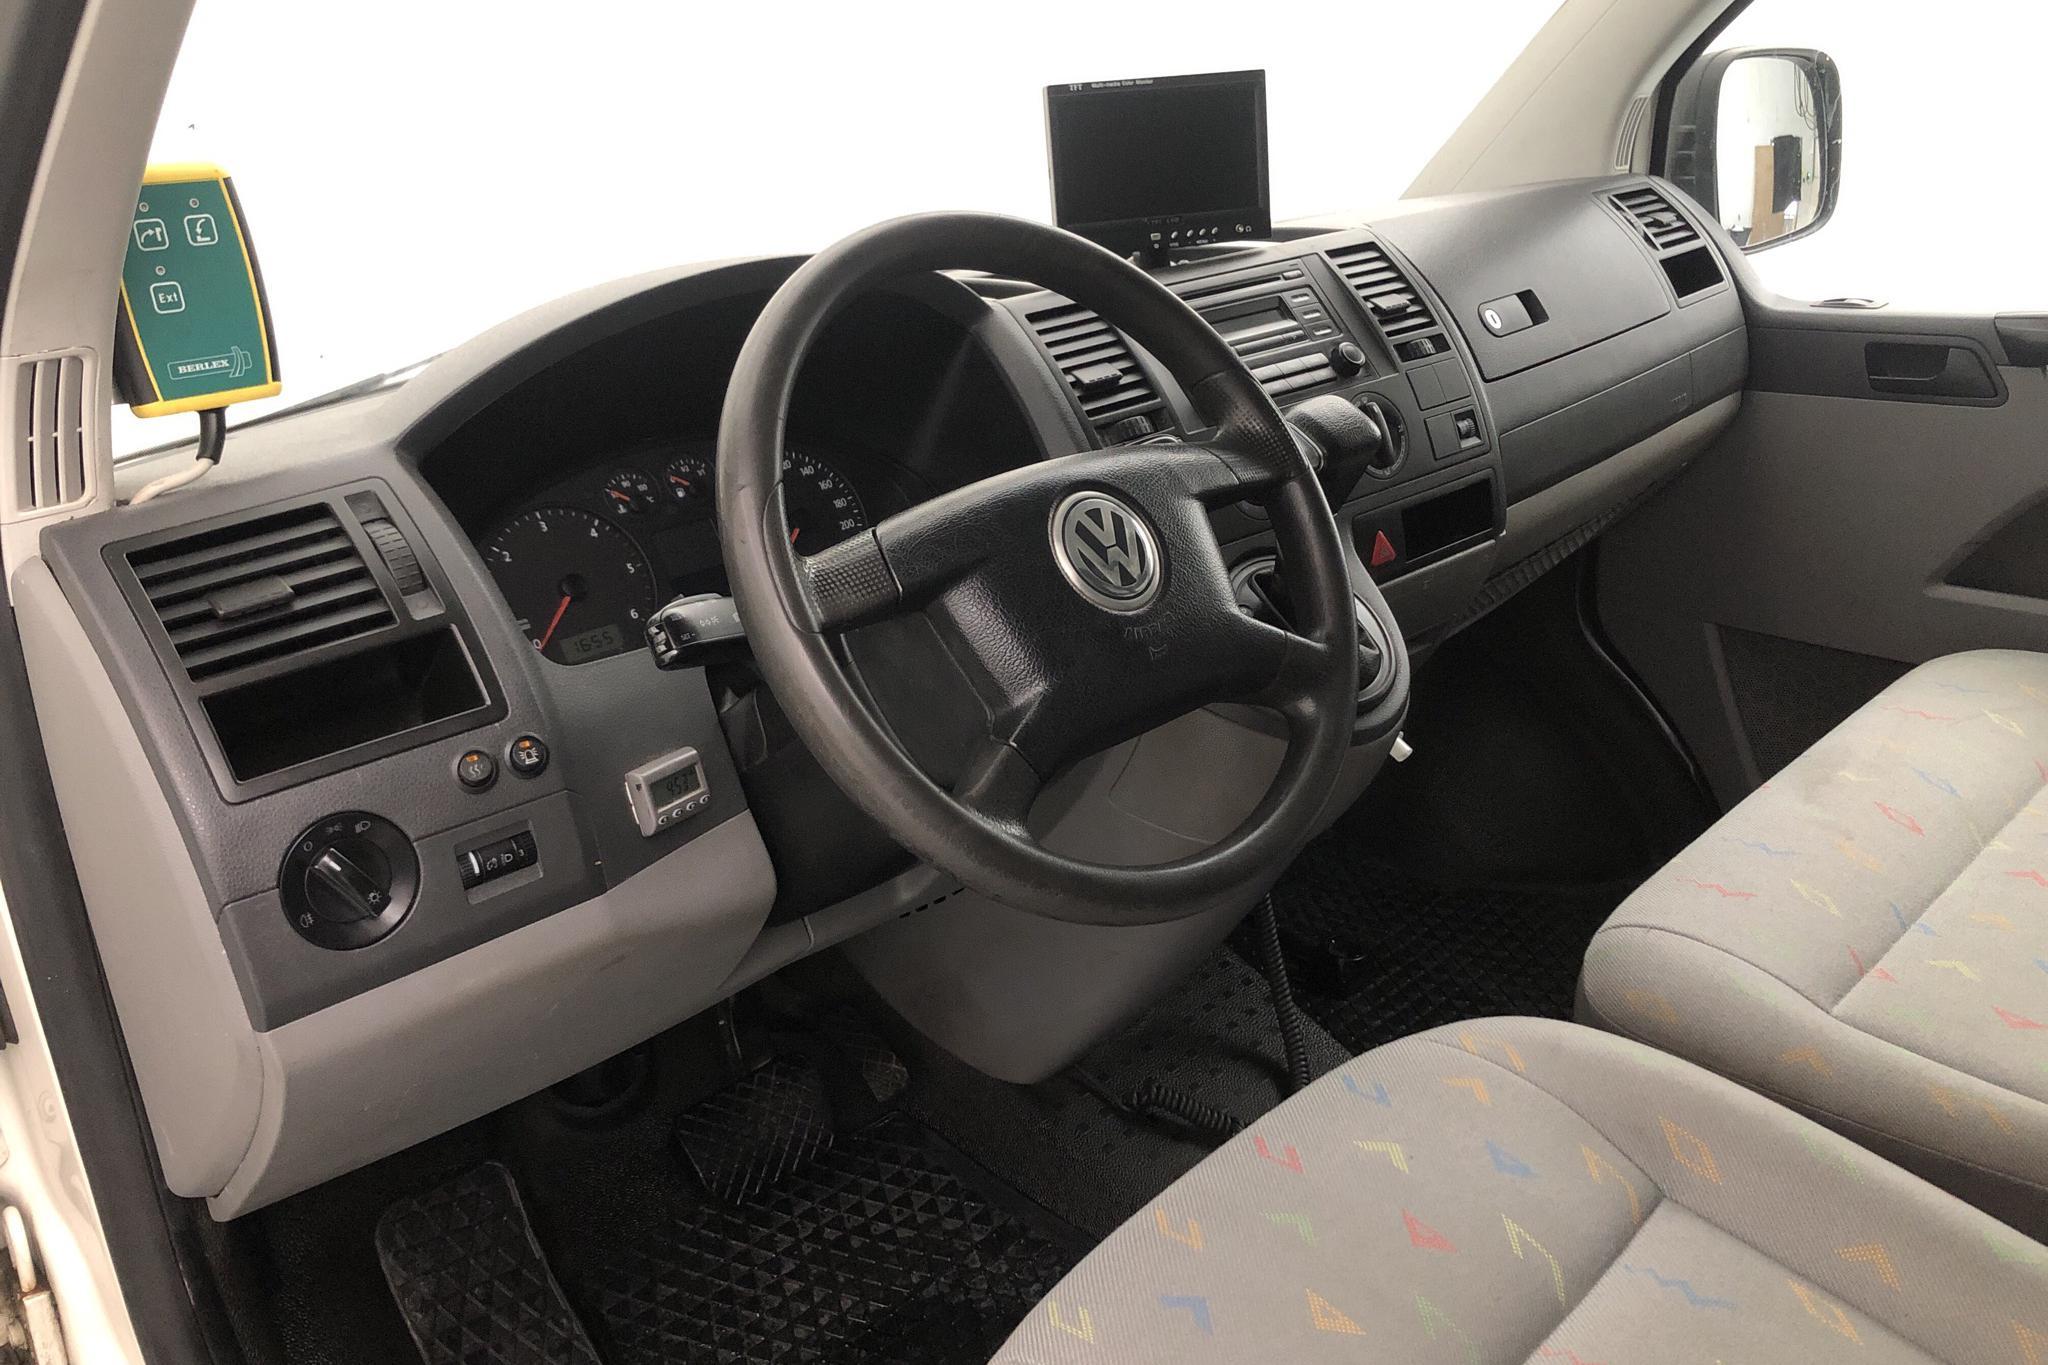 VW Transporter T5 2.5 TDI (130hk) - 188 060 km - Automatic - white - 2007